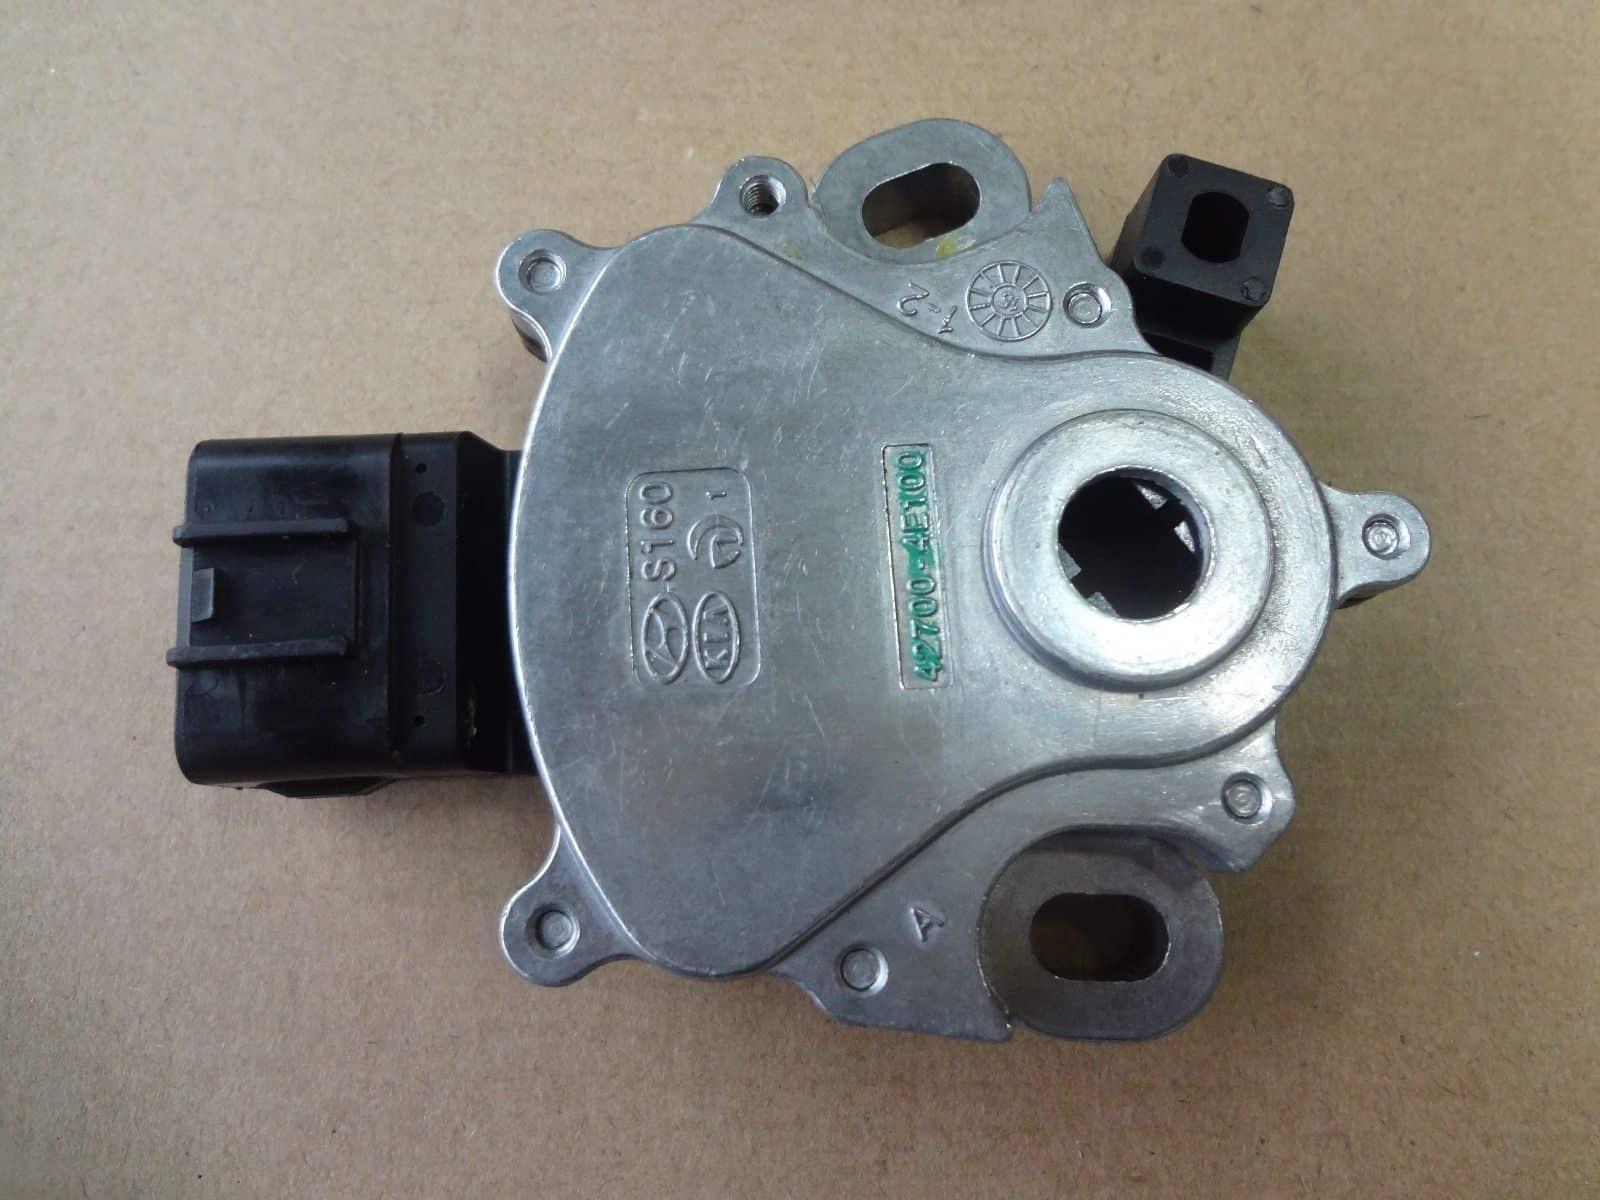 Genesis Auto Parts 427004e100 Neutral Safety Switch For Hyundai Genesis Coupe Lambda